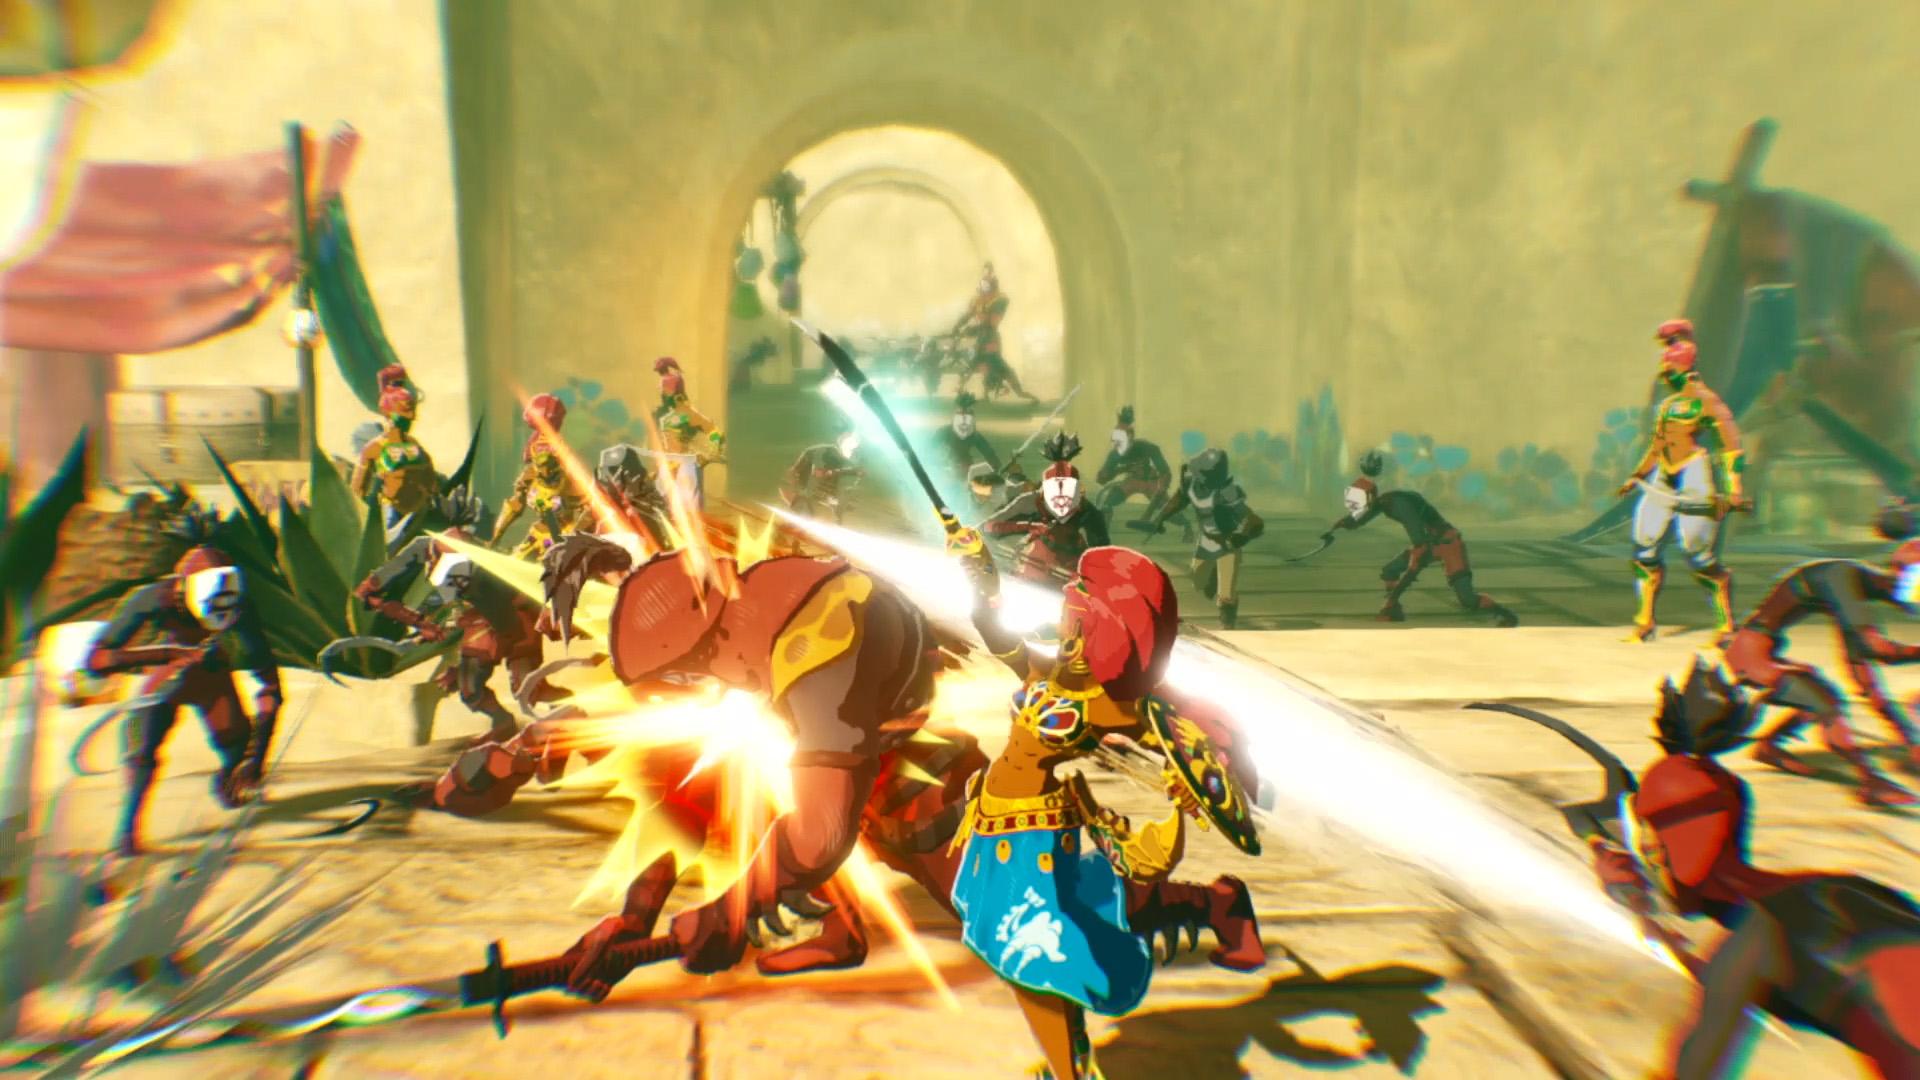 hyrule warriors age of calamity screenshot wallpaper 72512